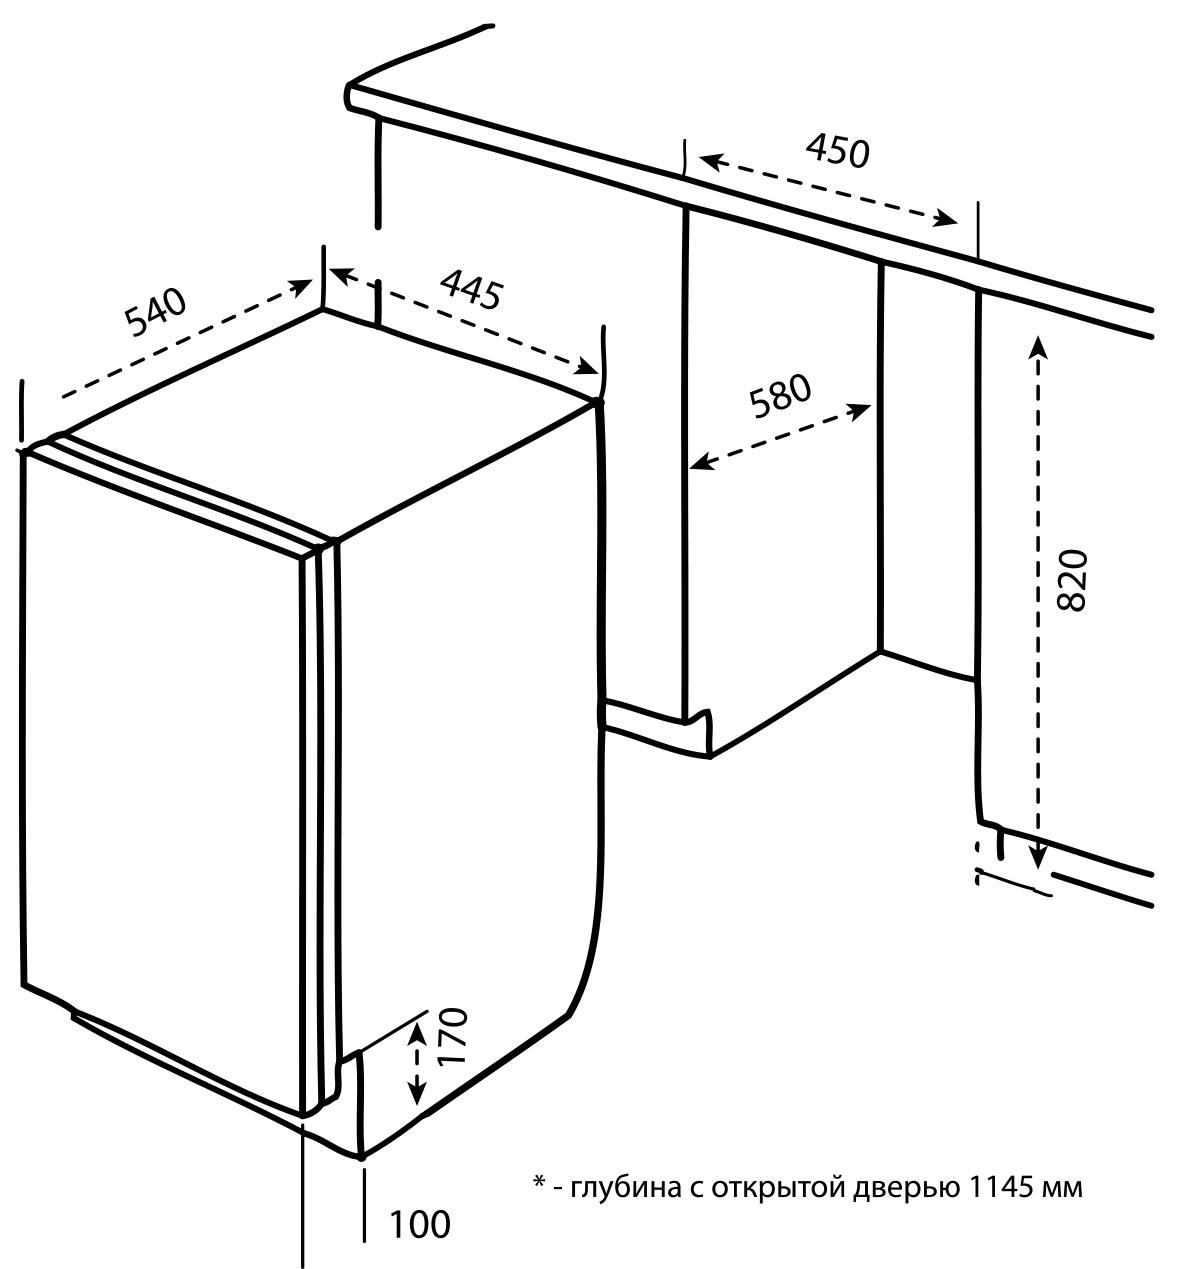 Схема встраивания посудомойки Korting KDI 4530